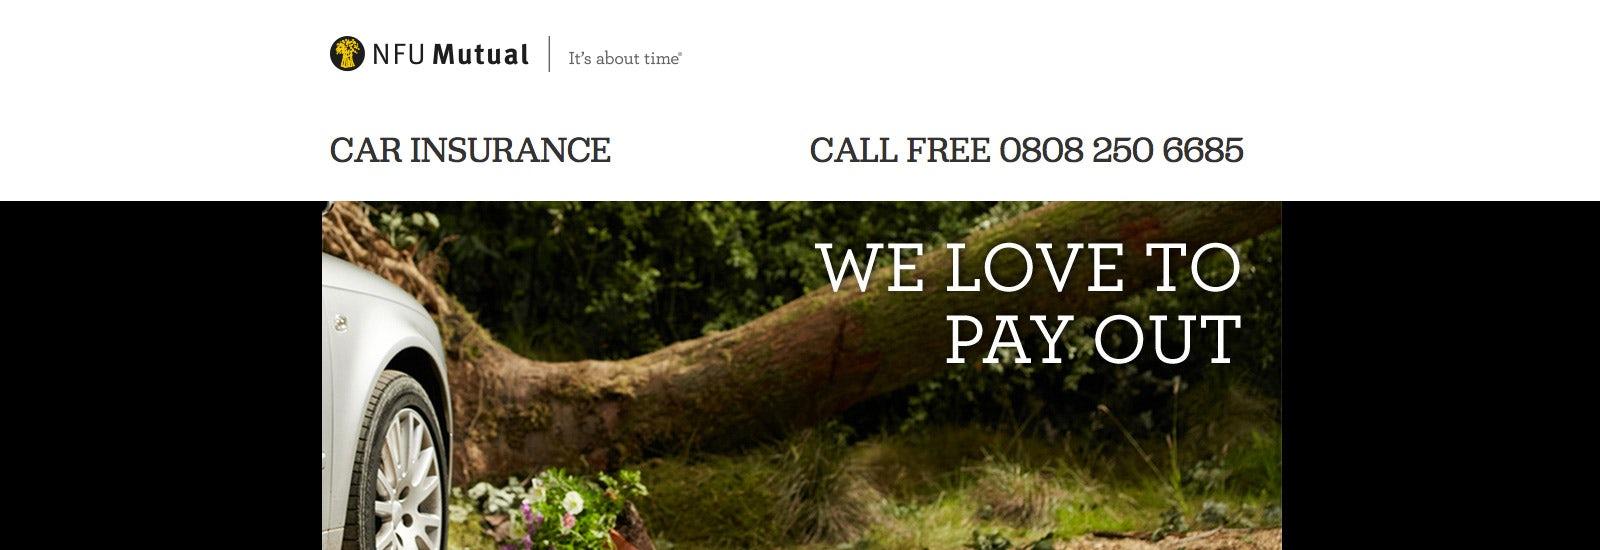 Alliance Car Insurance Customer Service Number